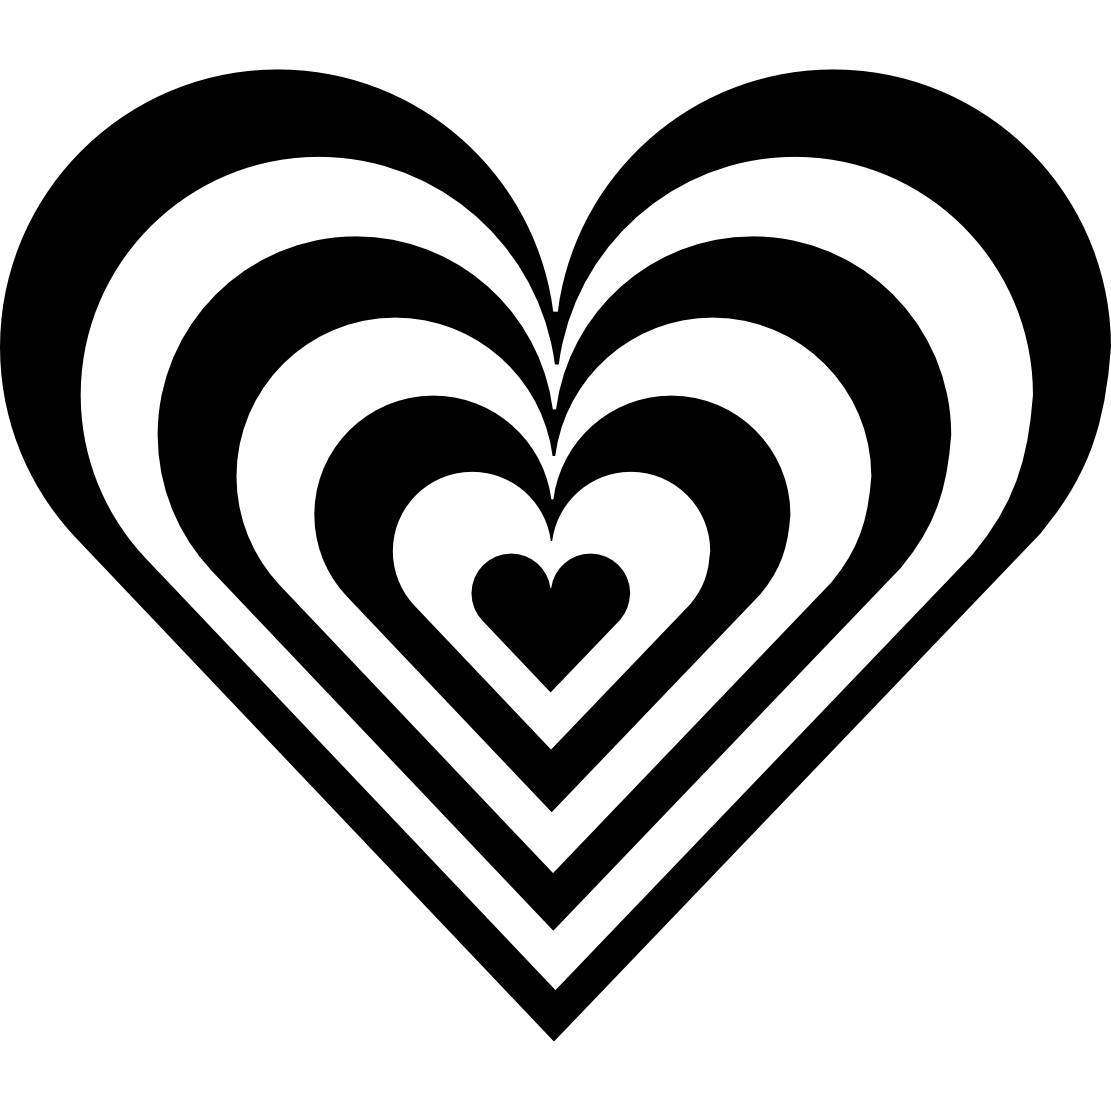 Heart Border Clipart Black And White-heart border clipart black and white-3